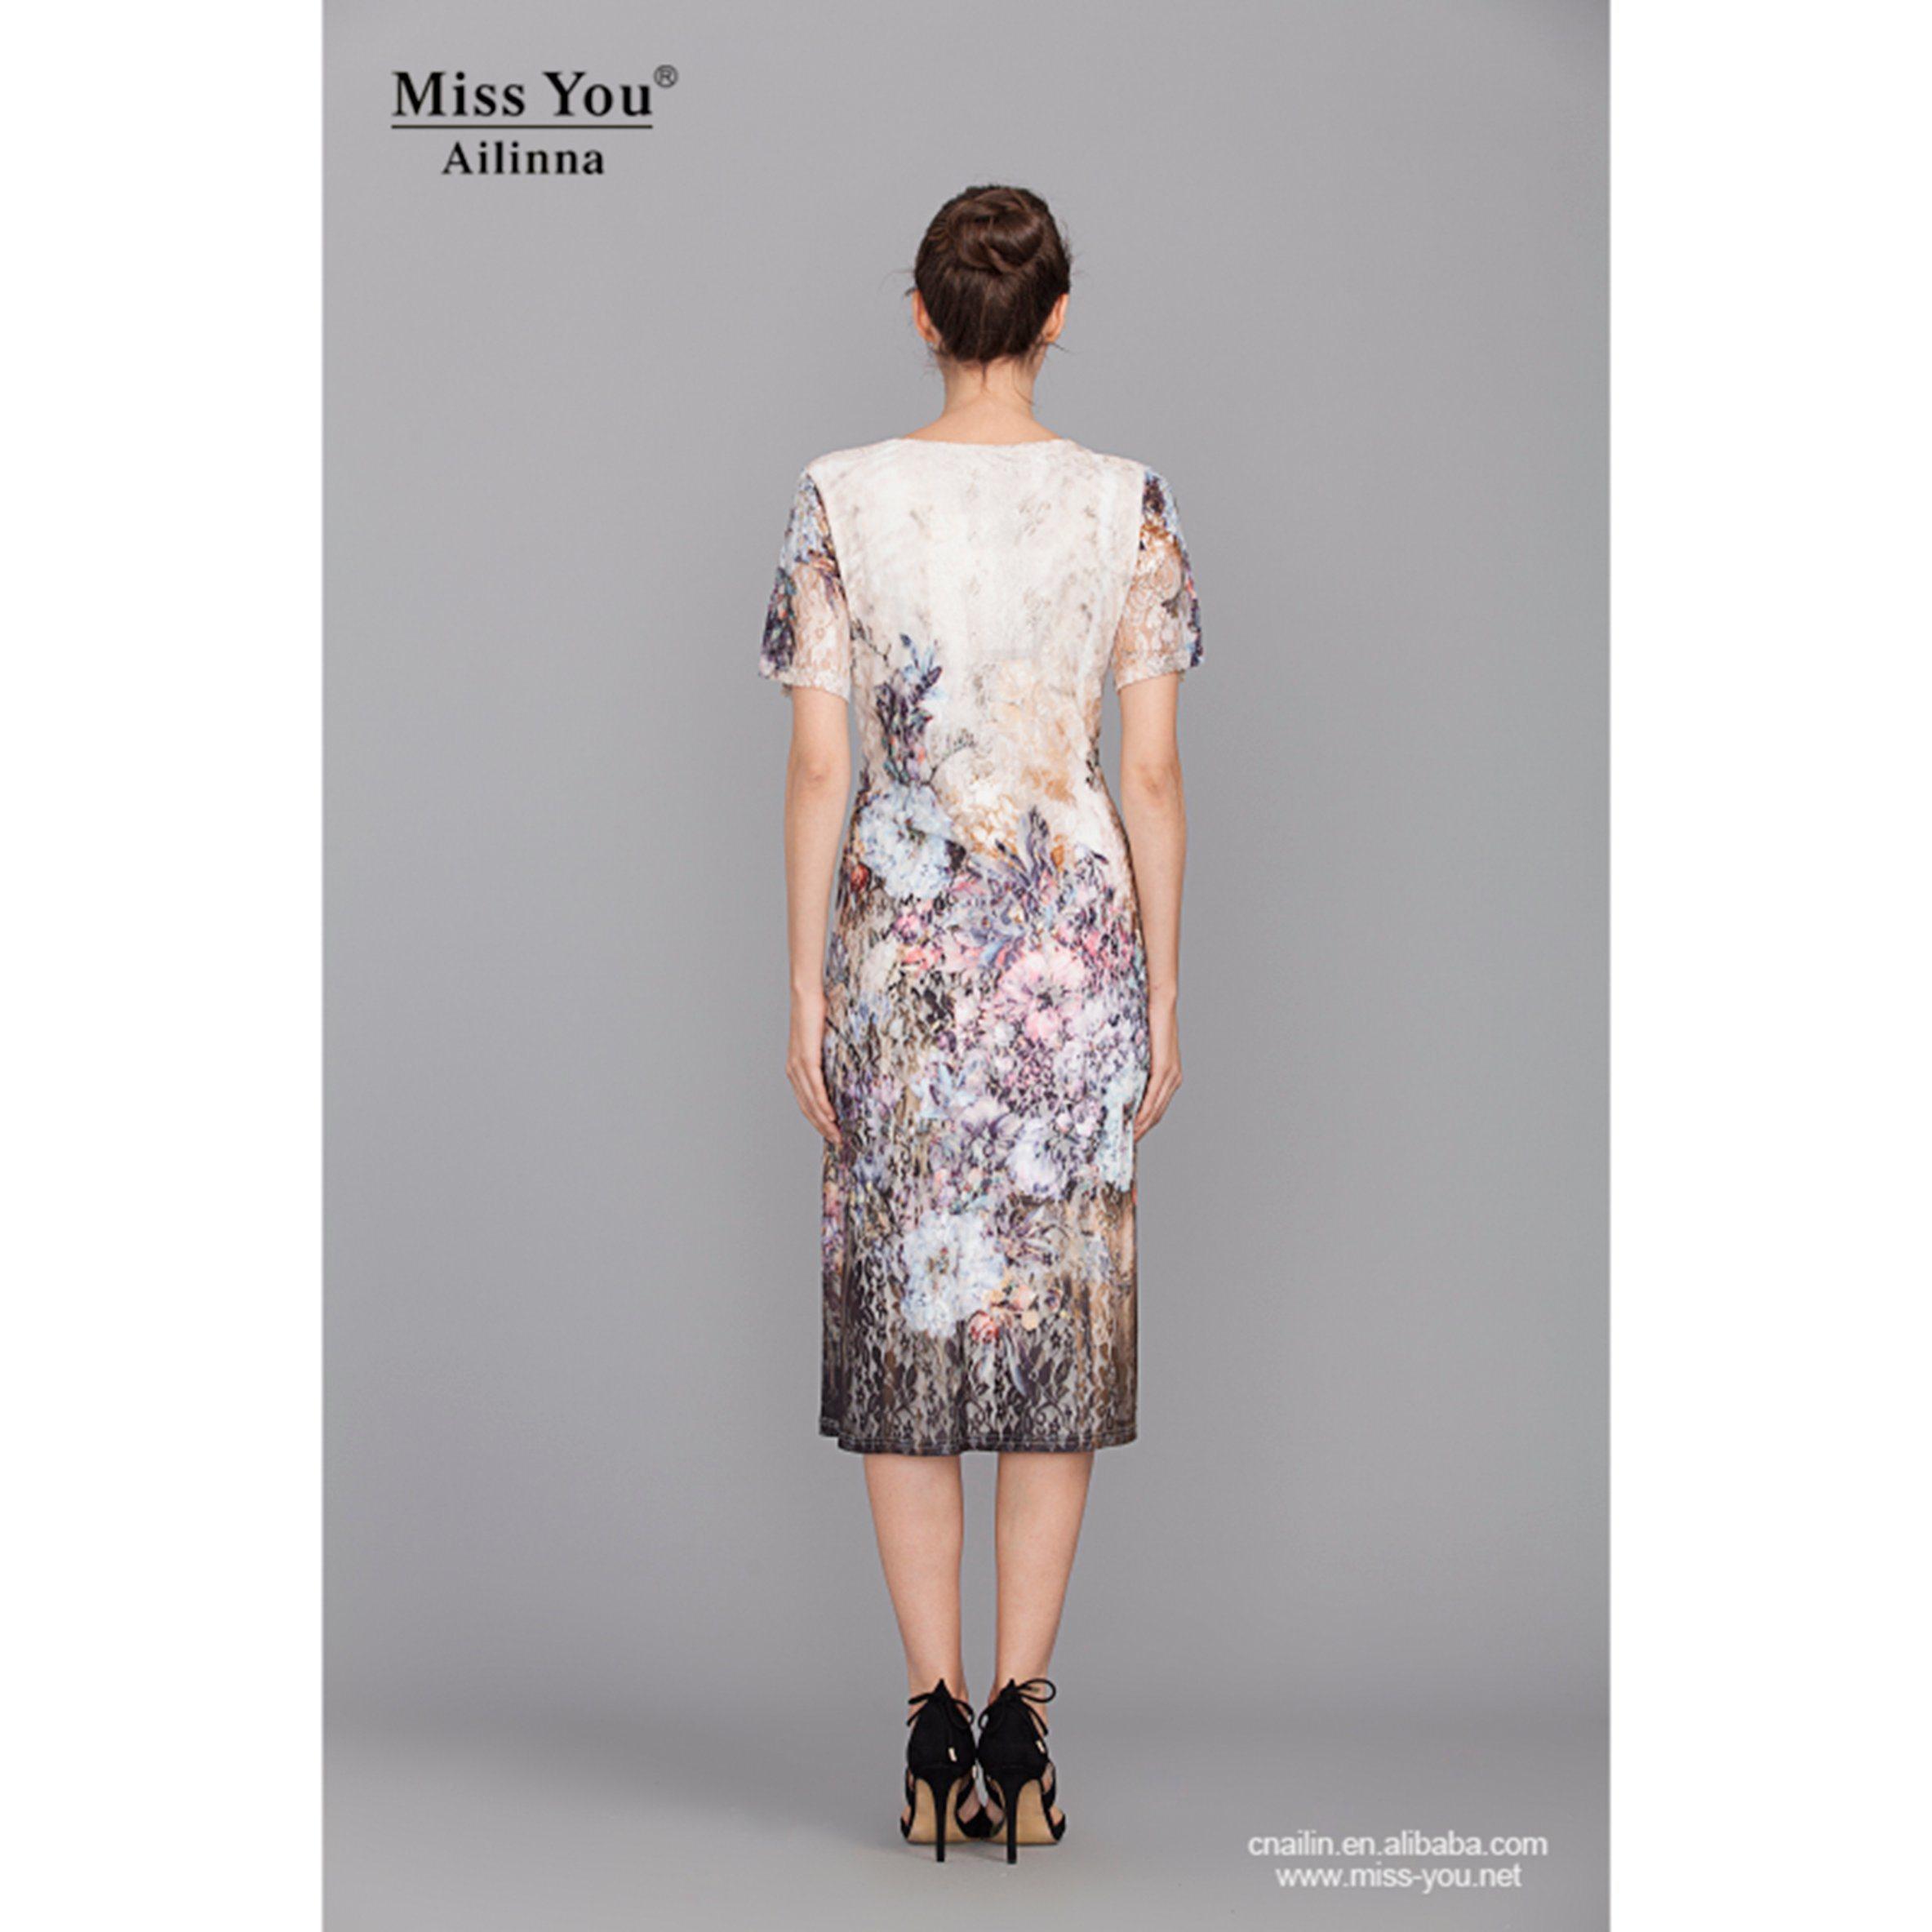 Miss You Ailinna 801398 Women Elegant White Lace Dress